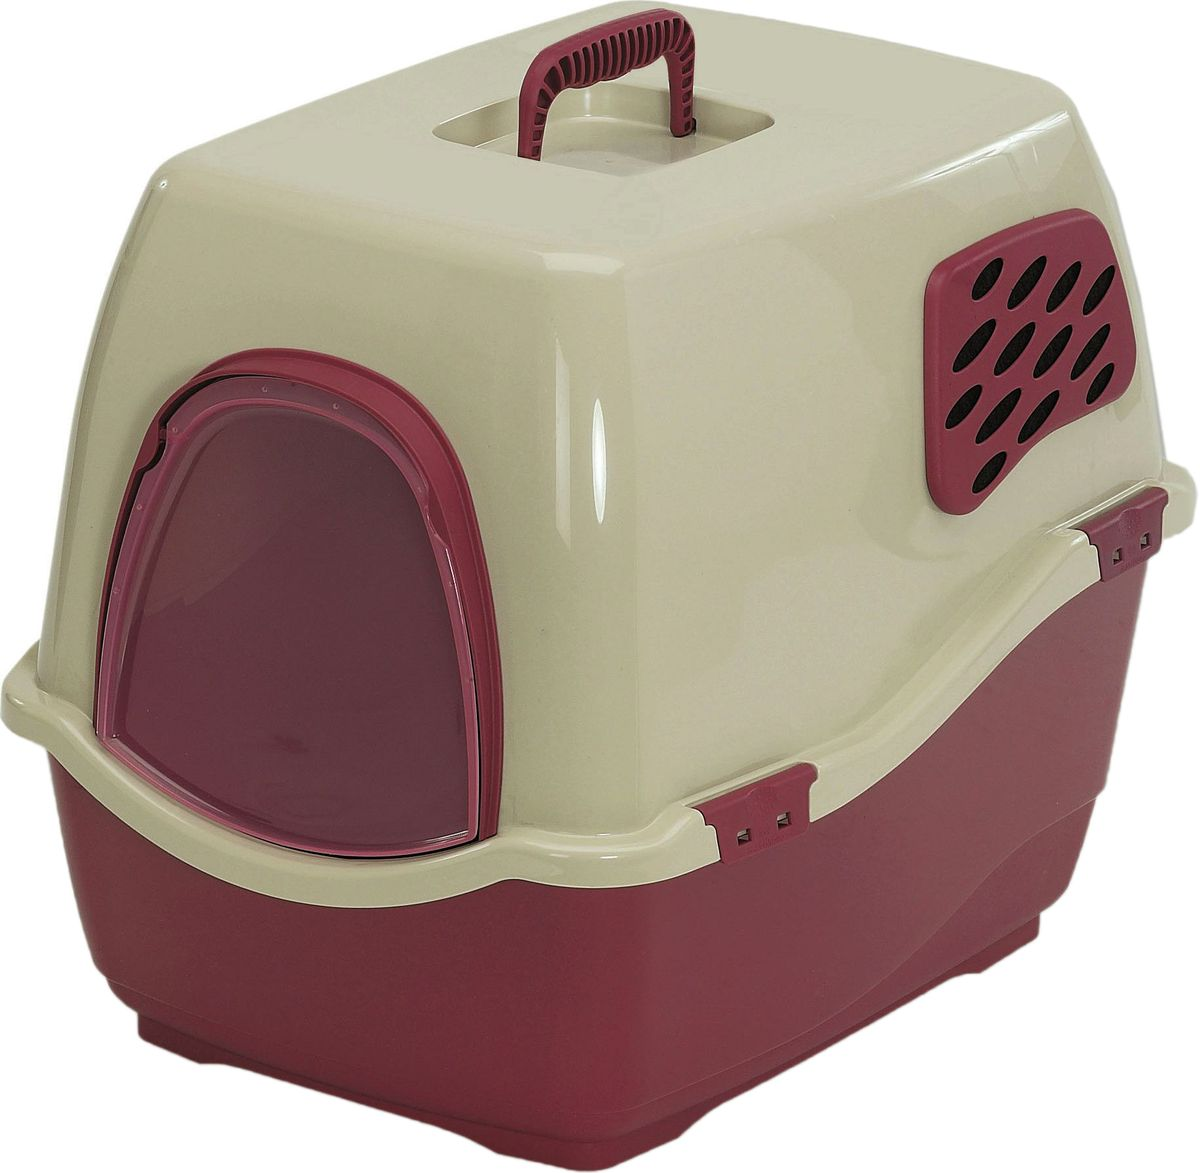 "Фото Био-туалет для животных Marchioro ""Bill 1F"", цвет: коричневый, бежевый, 50 х 40 х 42 см"